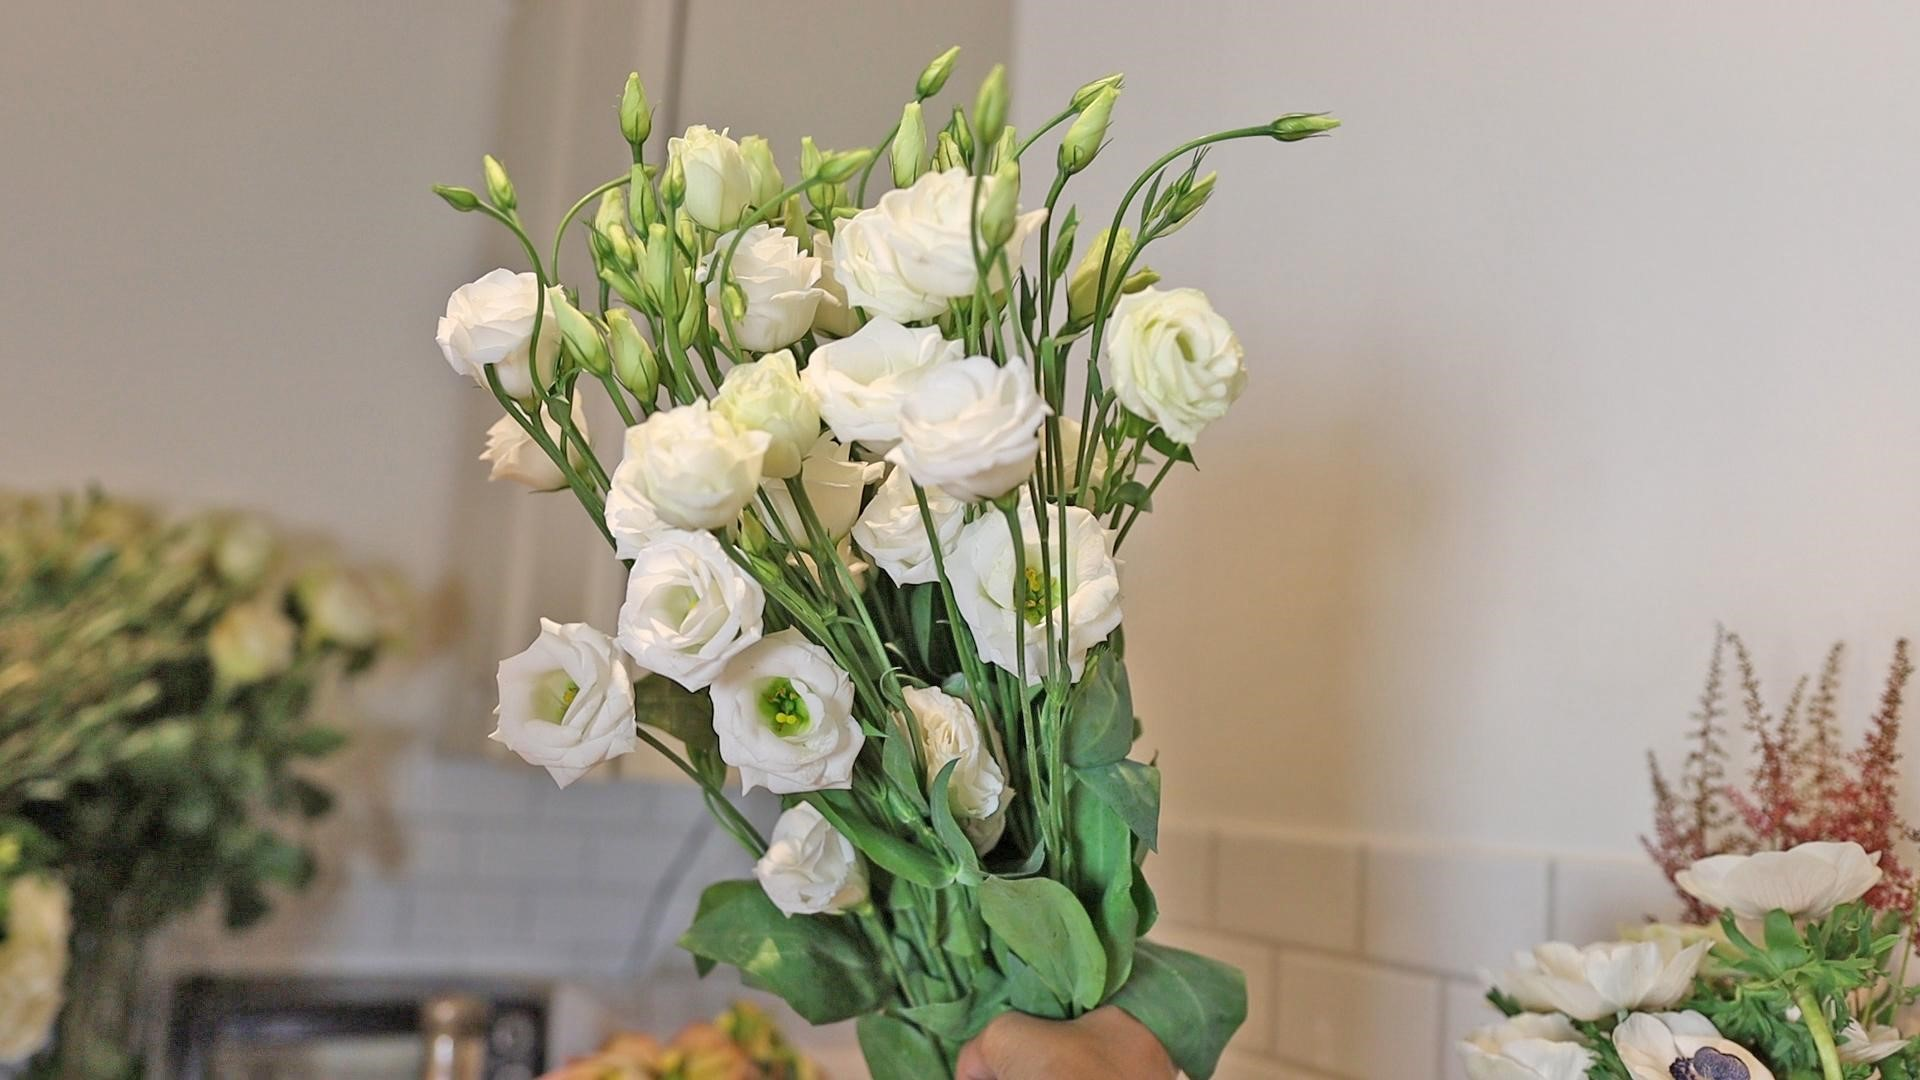 Amitha holding a fresh bunch of white lisianthus flowers